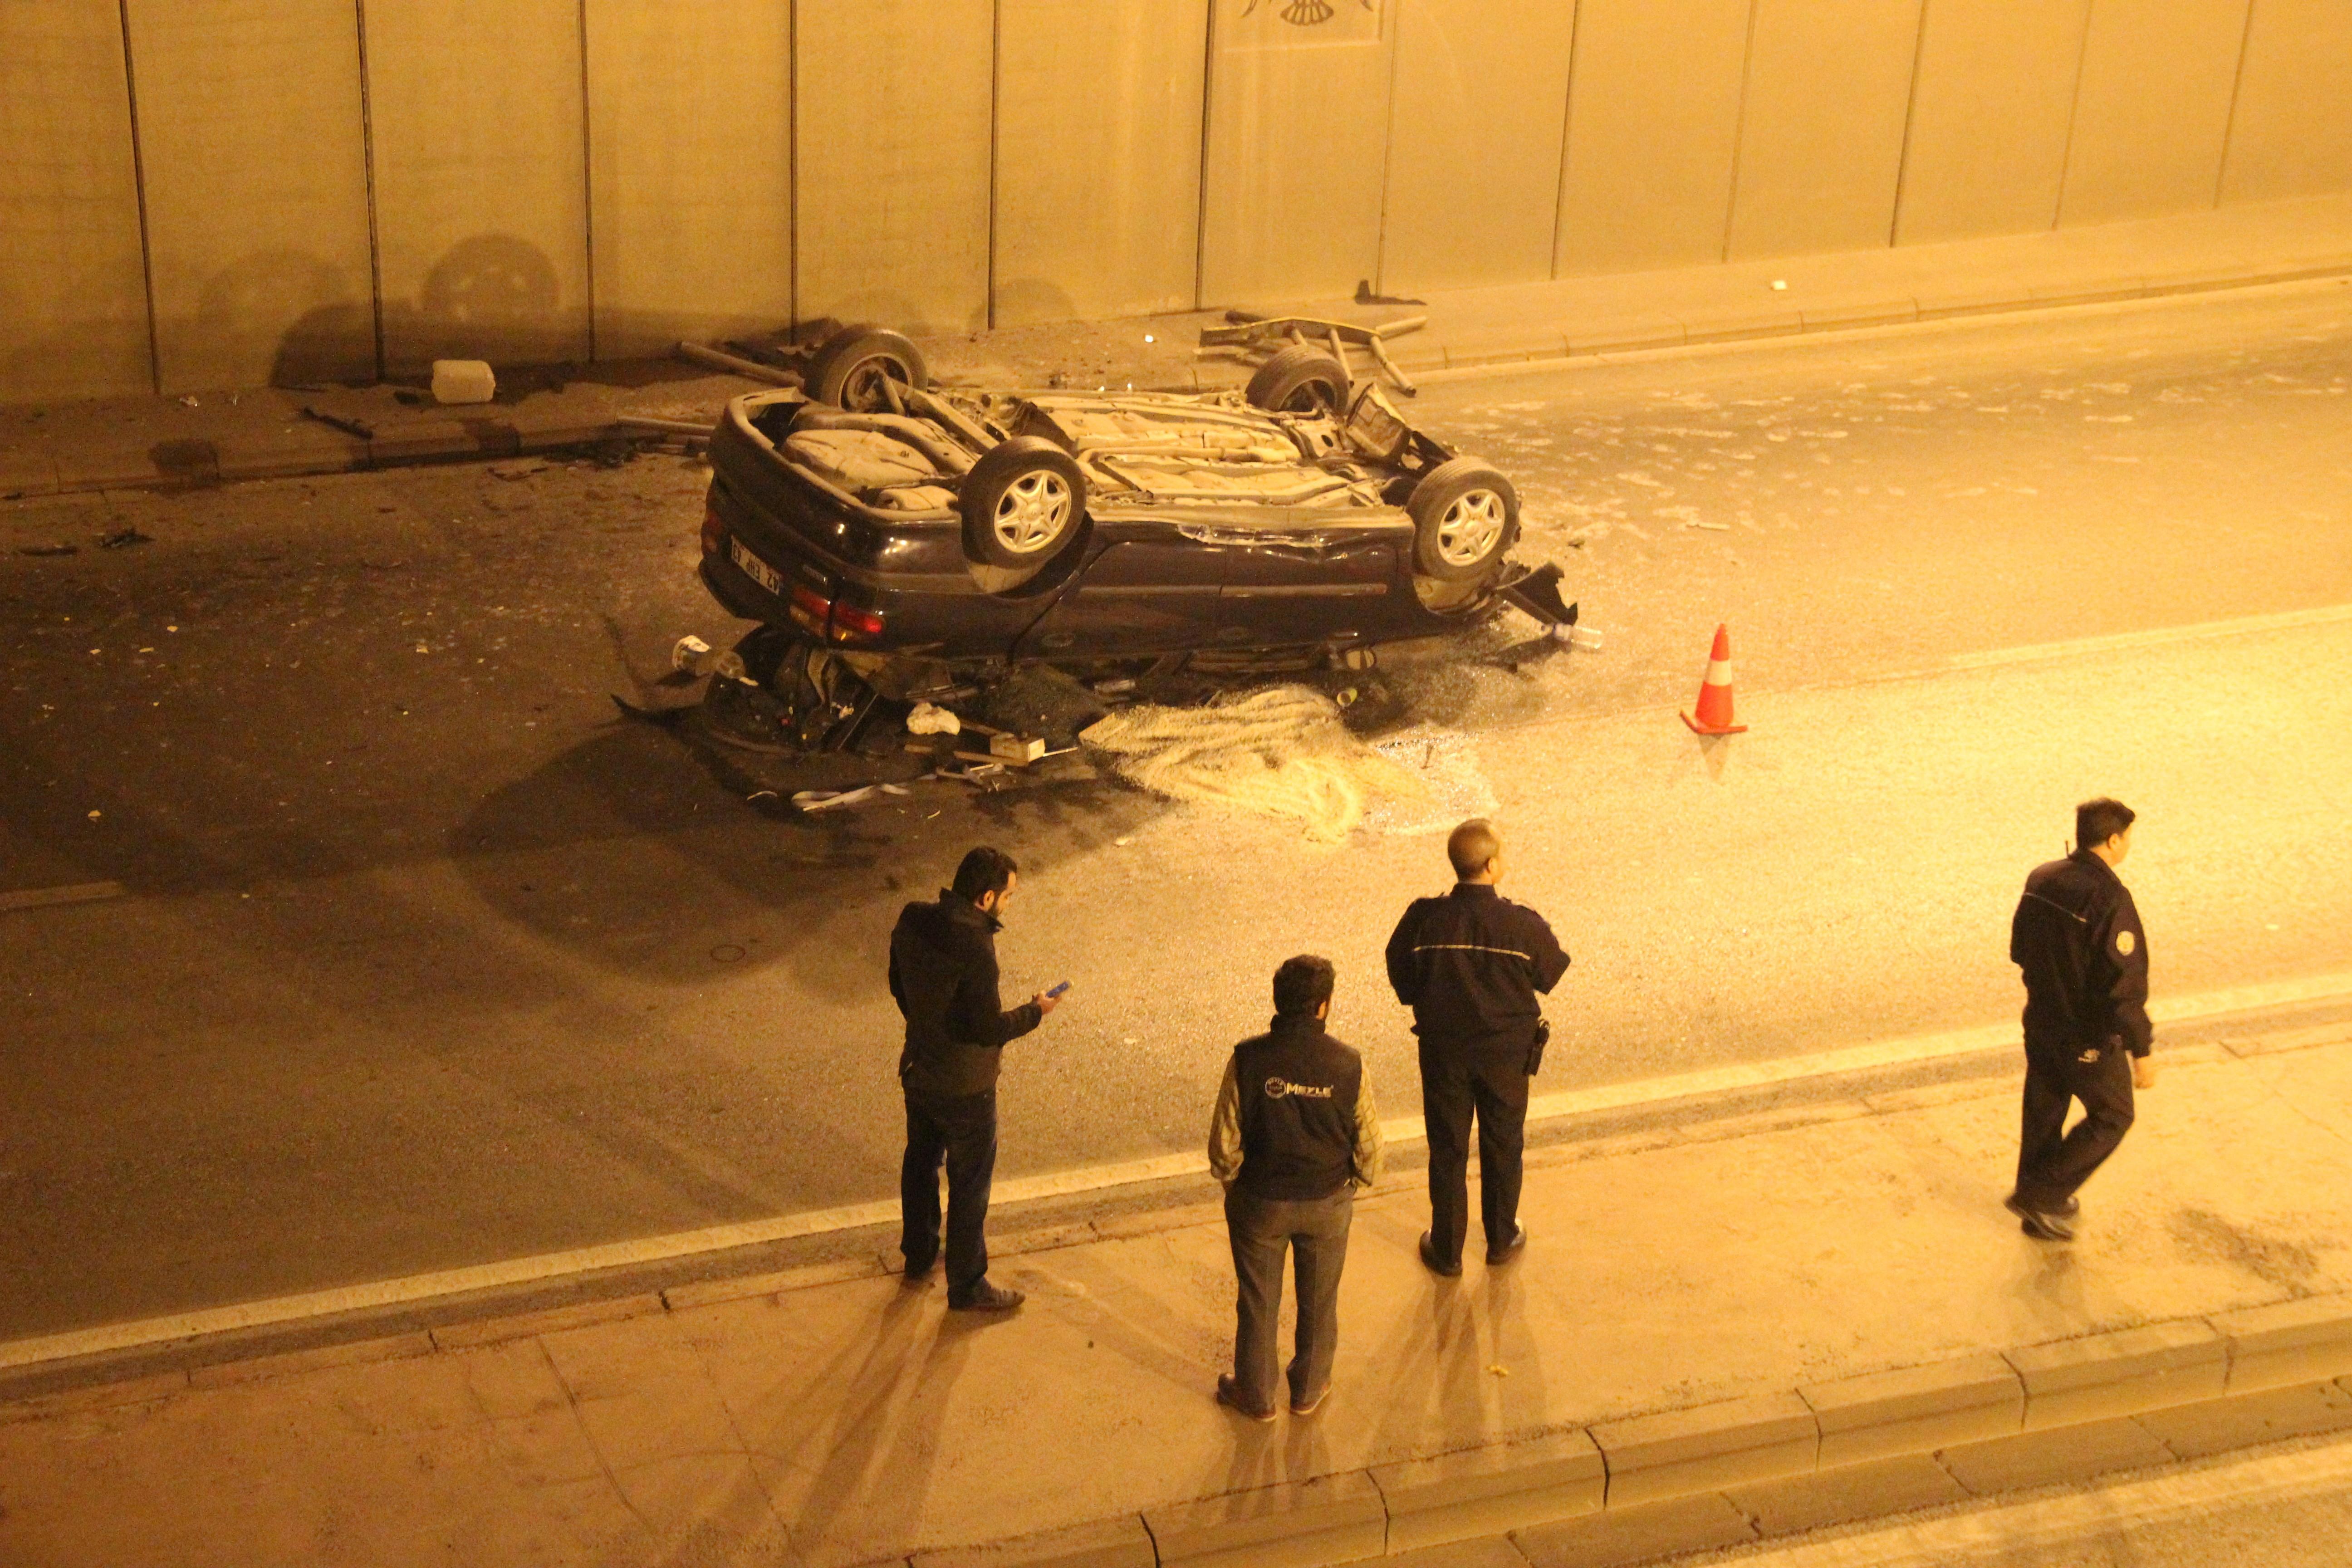 Otomobil Alt Geçite Uçtu: 1 yaralı